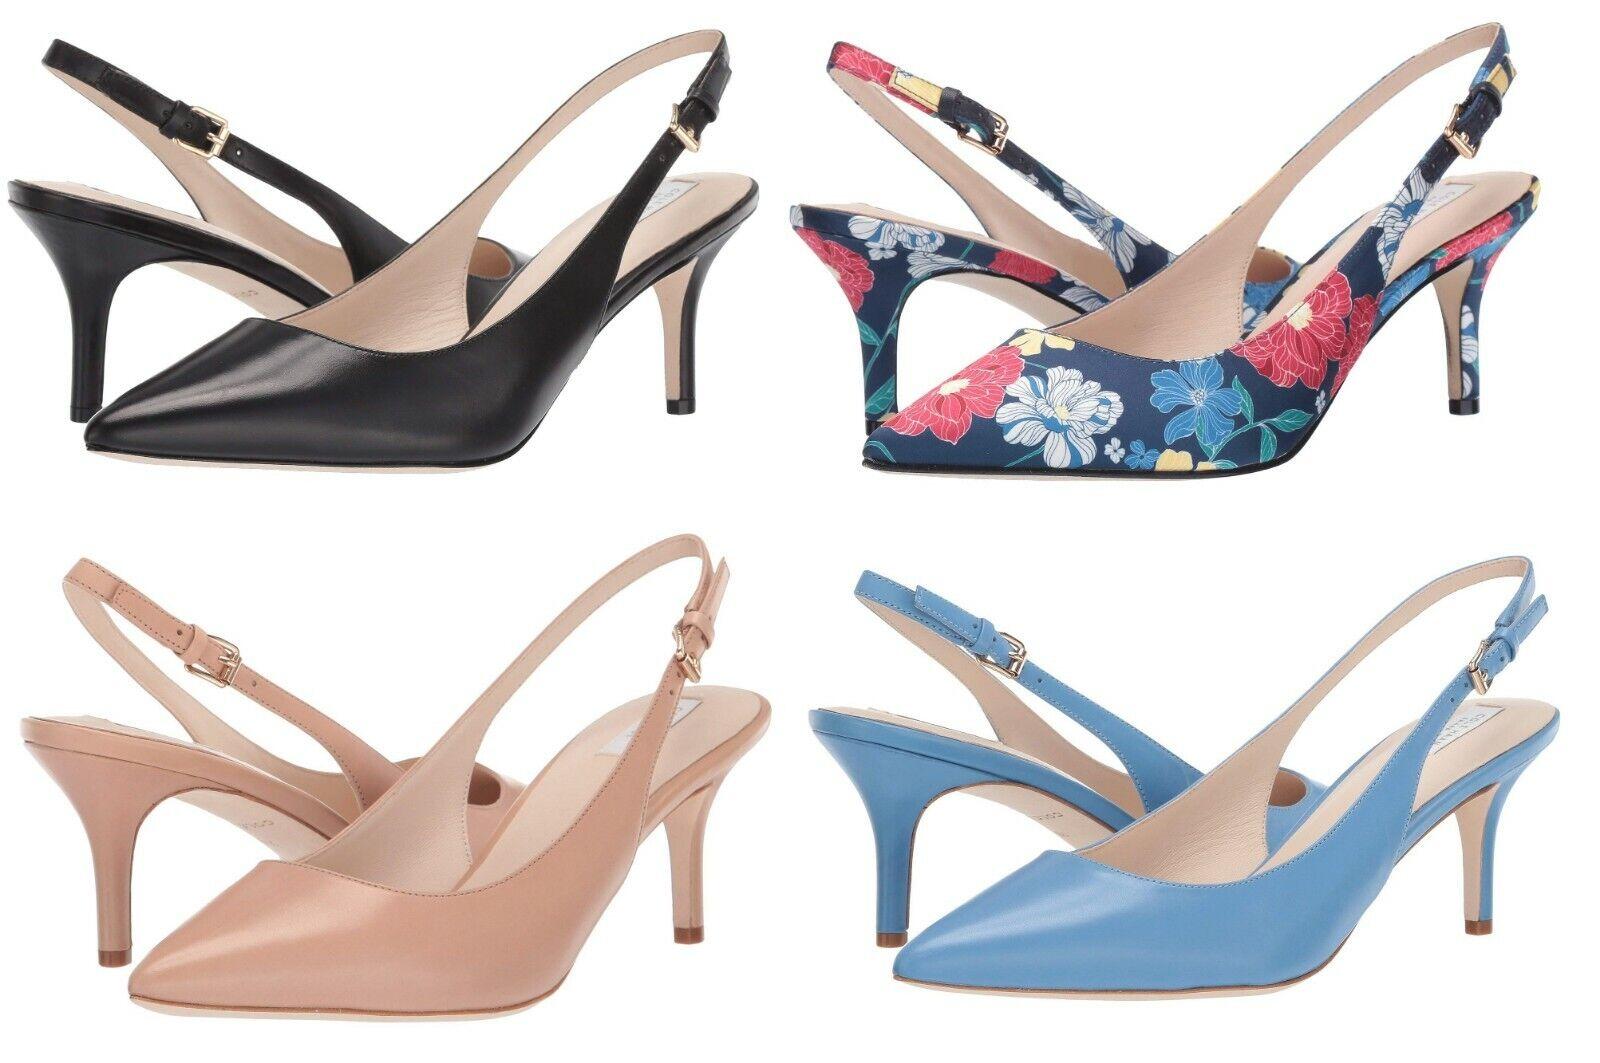 Cole Haan Women Vesta Slingback Pump 65 mm Stiletto Heels Casual Dress Shoes